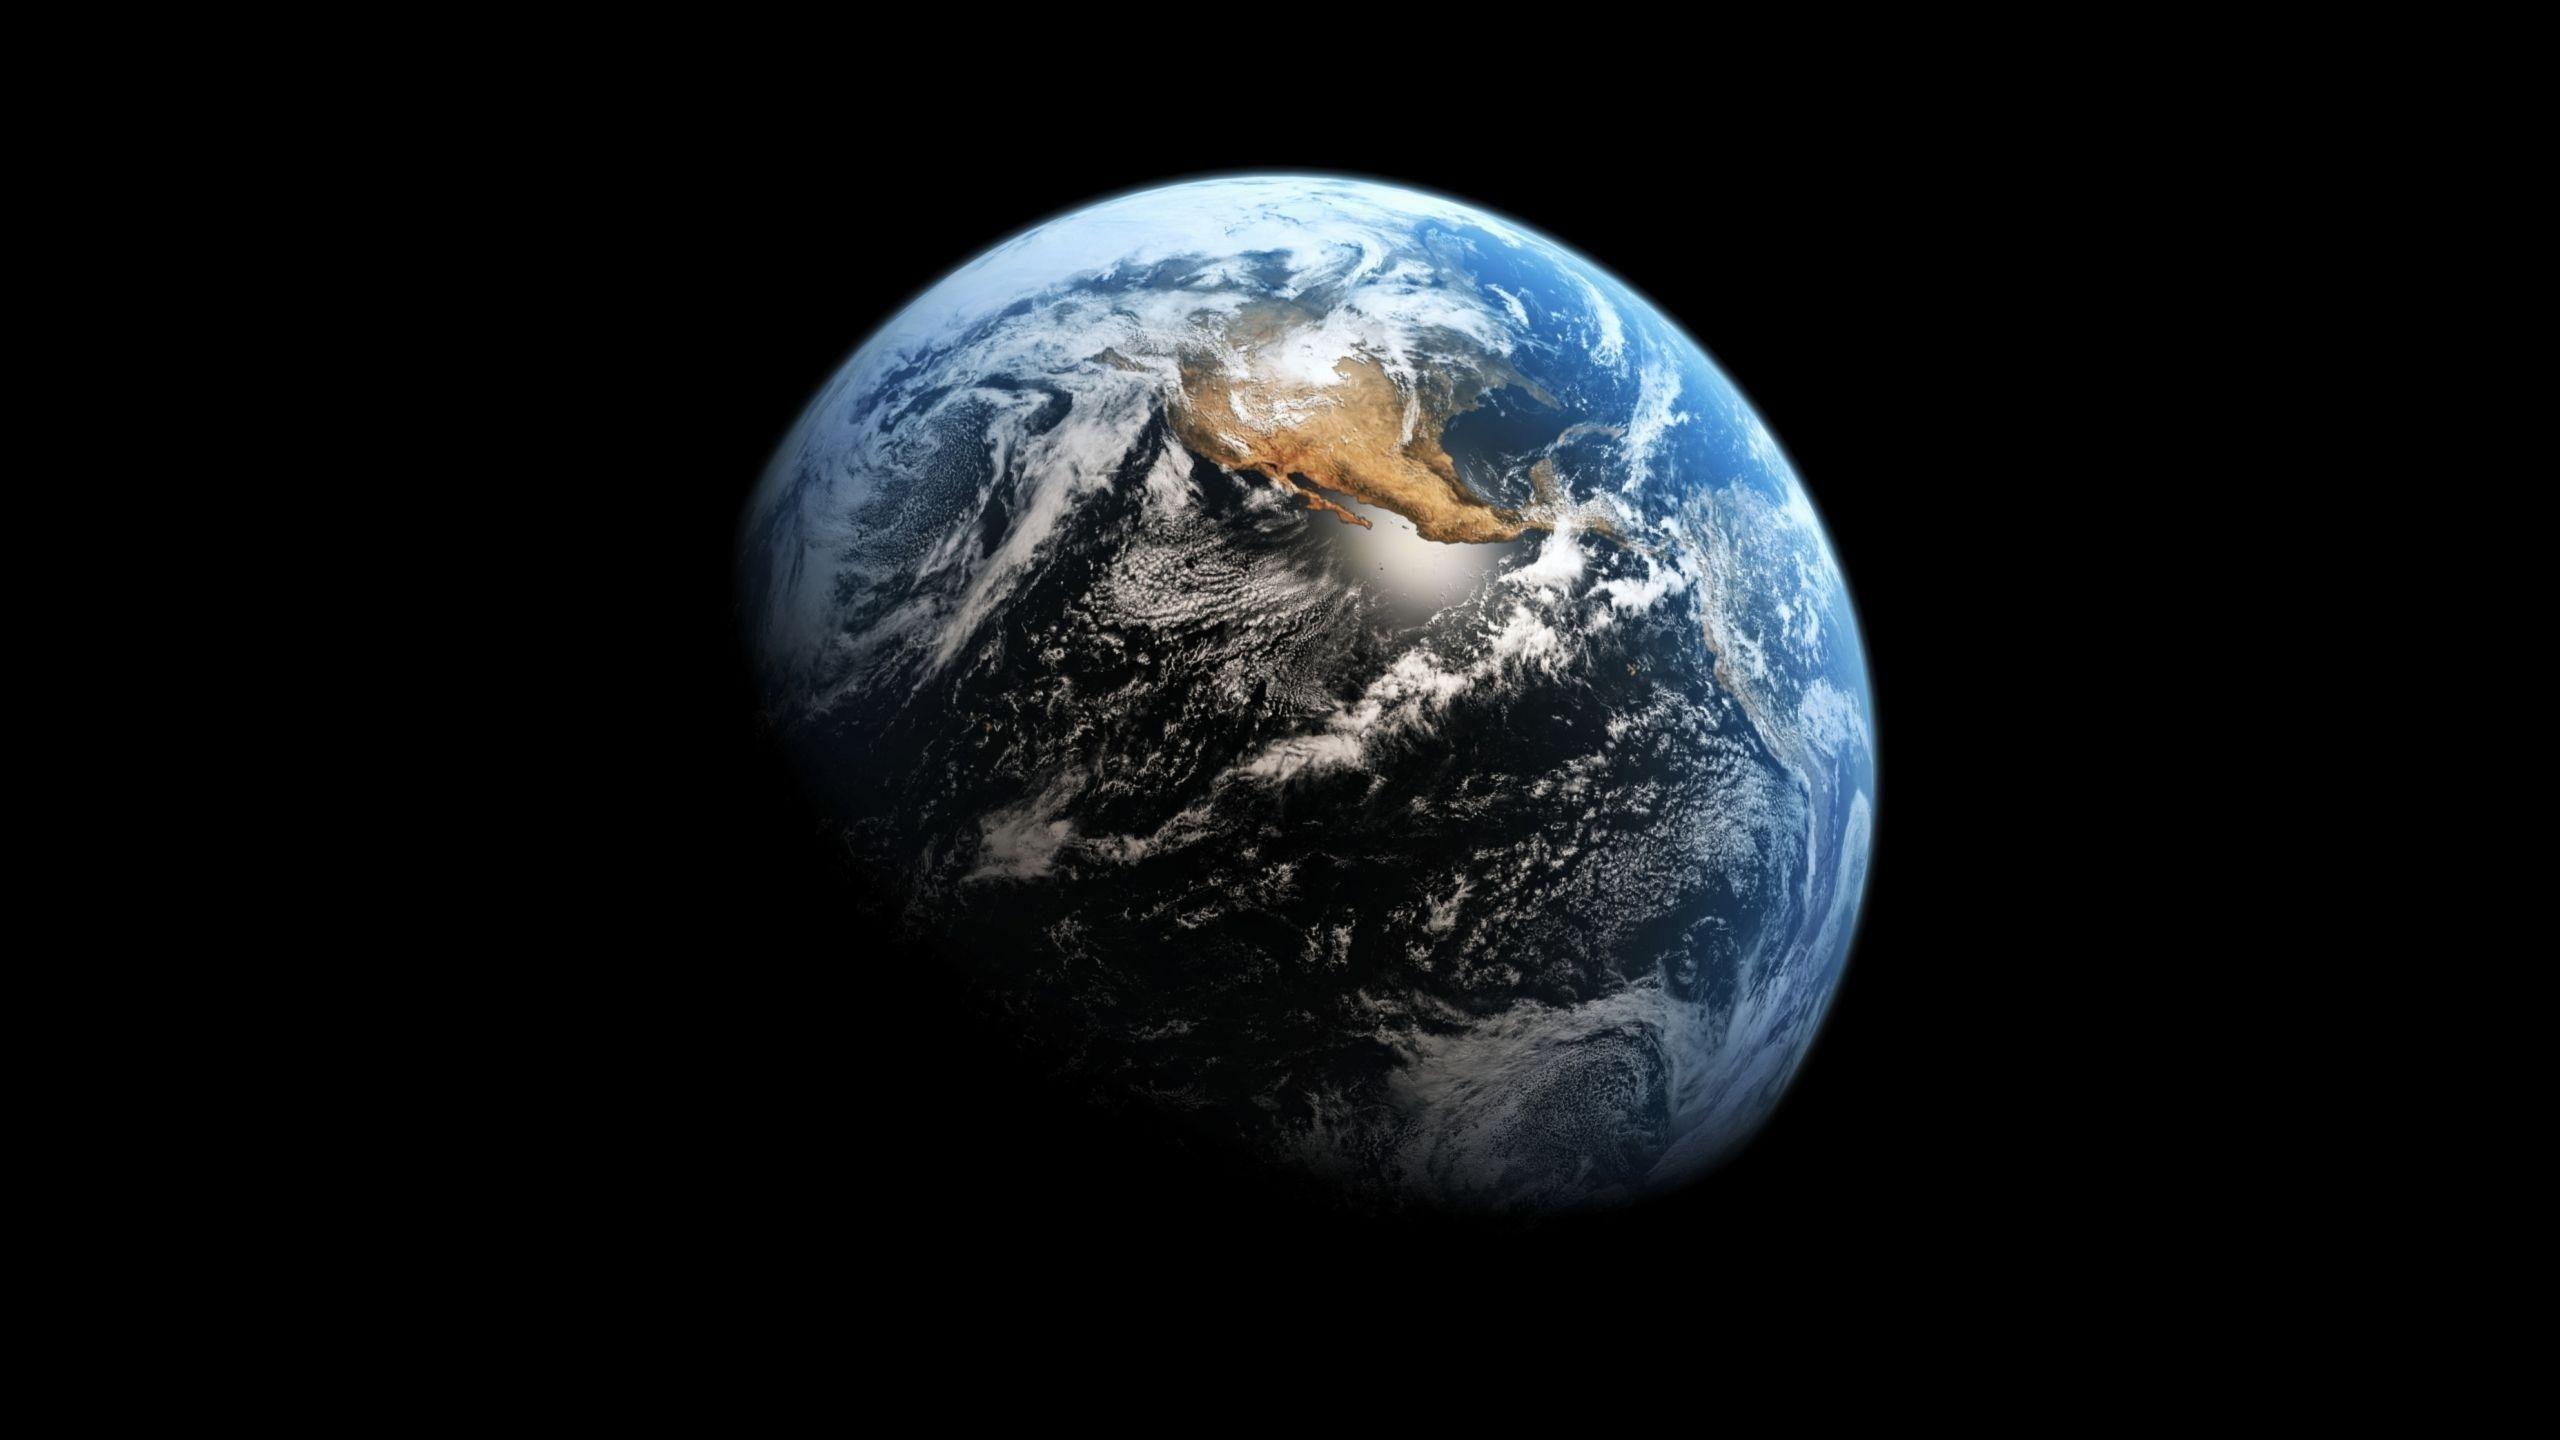 10 Best Wallpaper For Imac 27 Inch Full Hd 1920 1080 For Pc Background Wallpaper Earth Earth Hd Iphone Wallpaper Earth